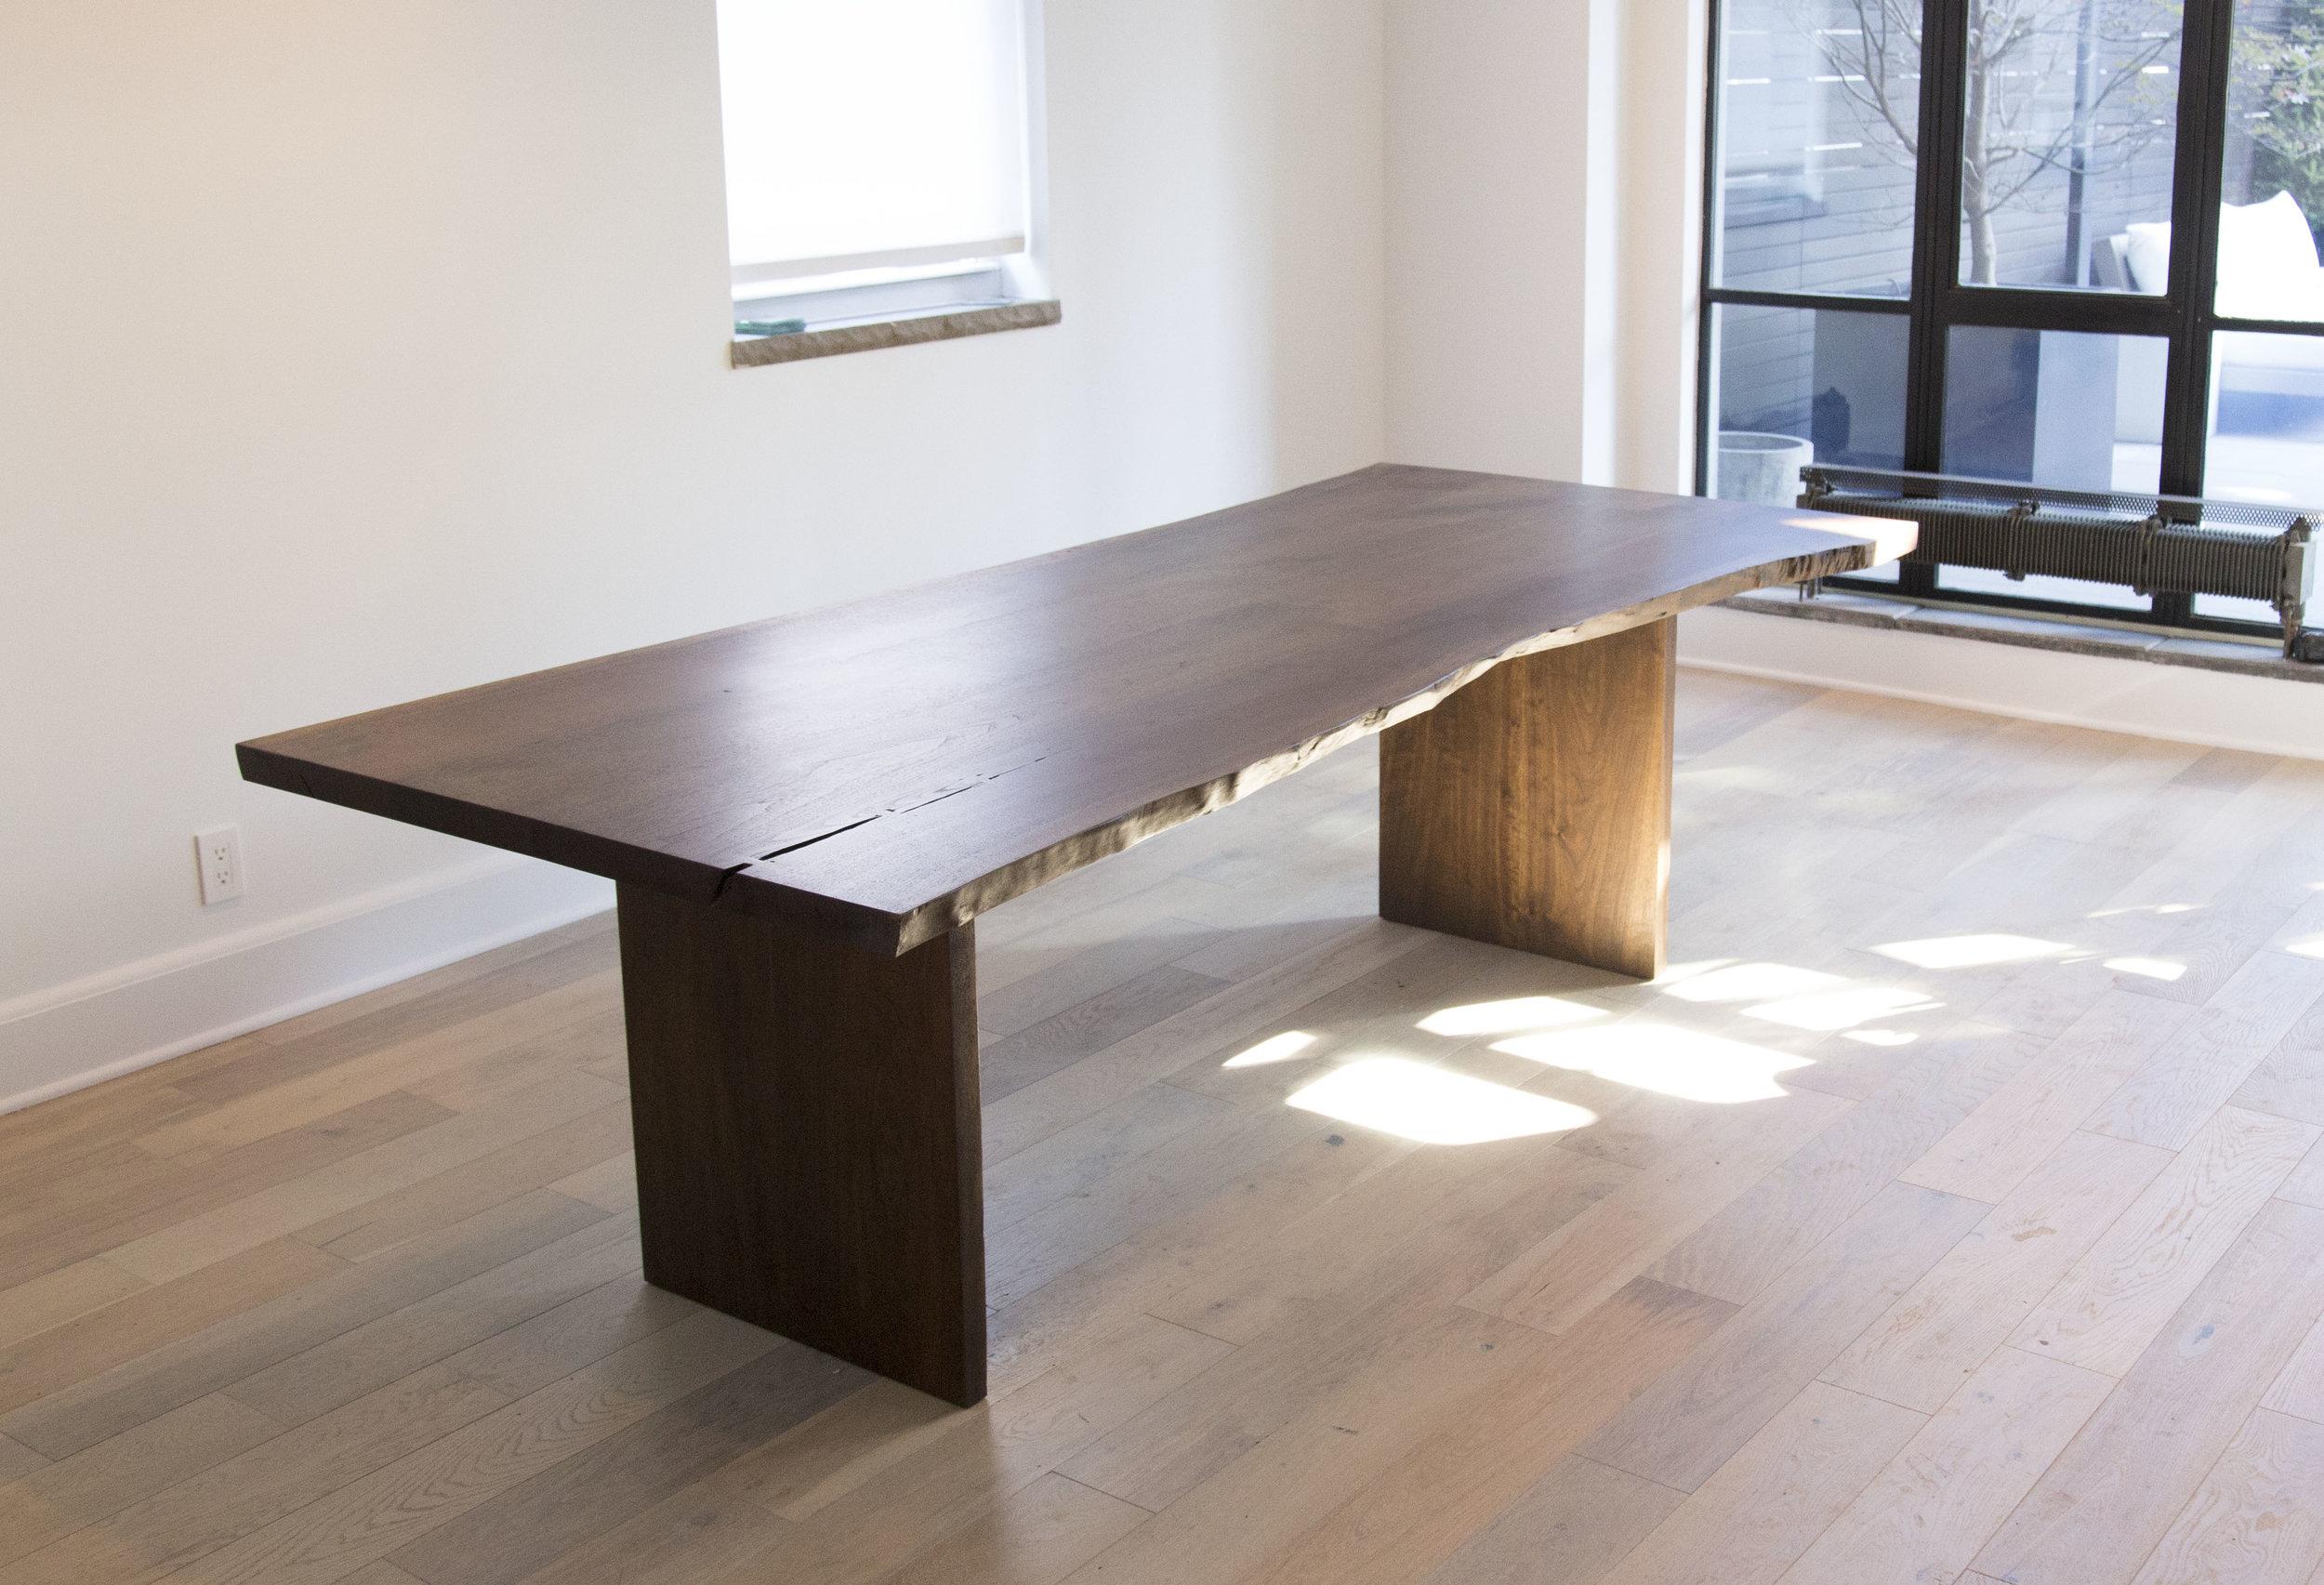 Bowery_Live_edge_table.jpg